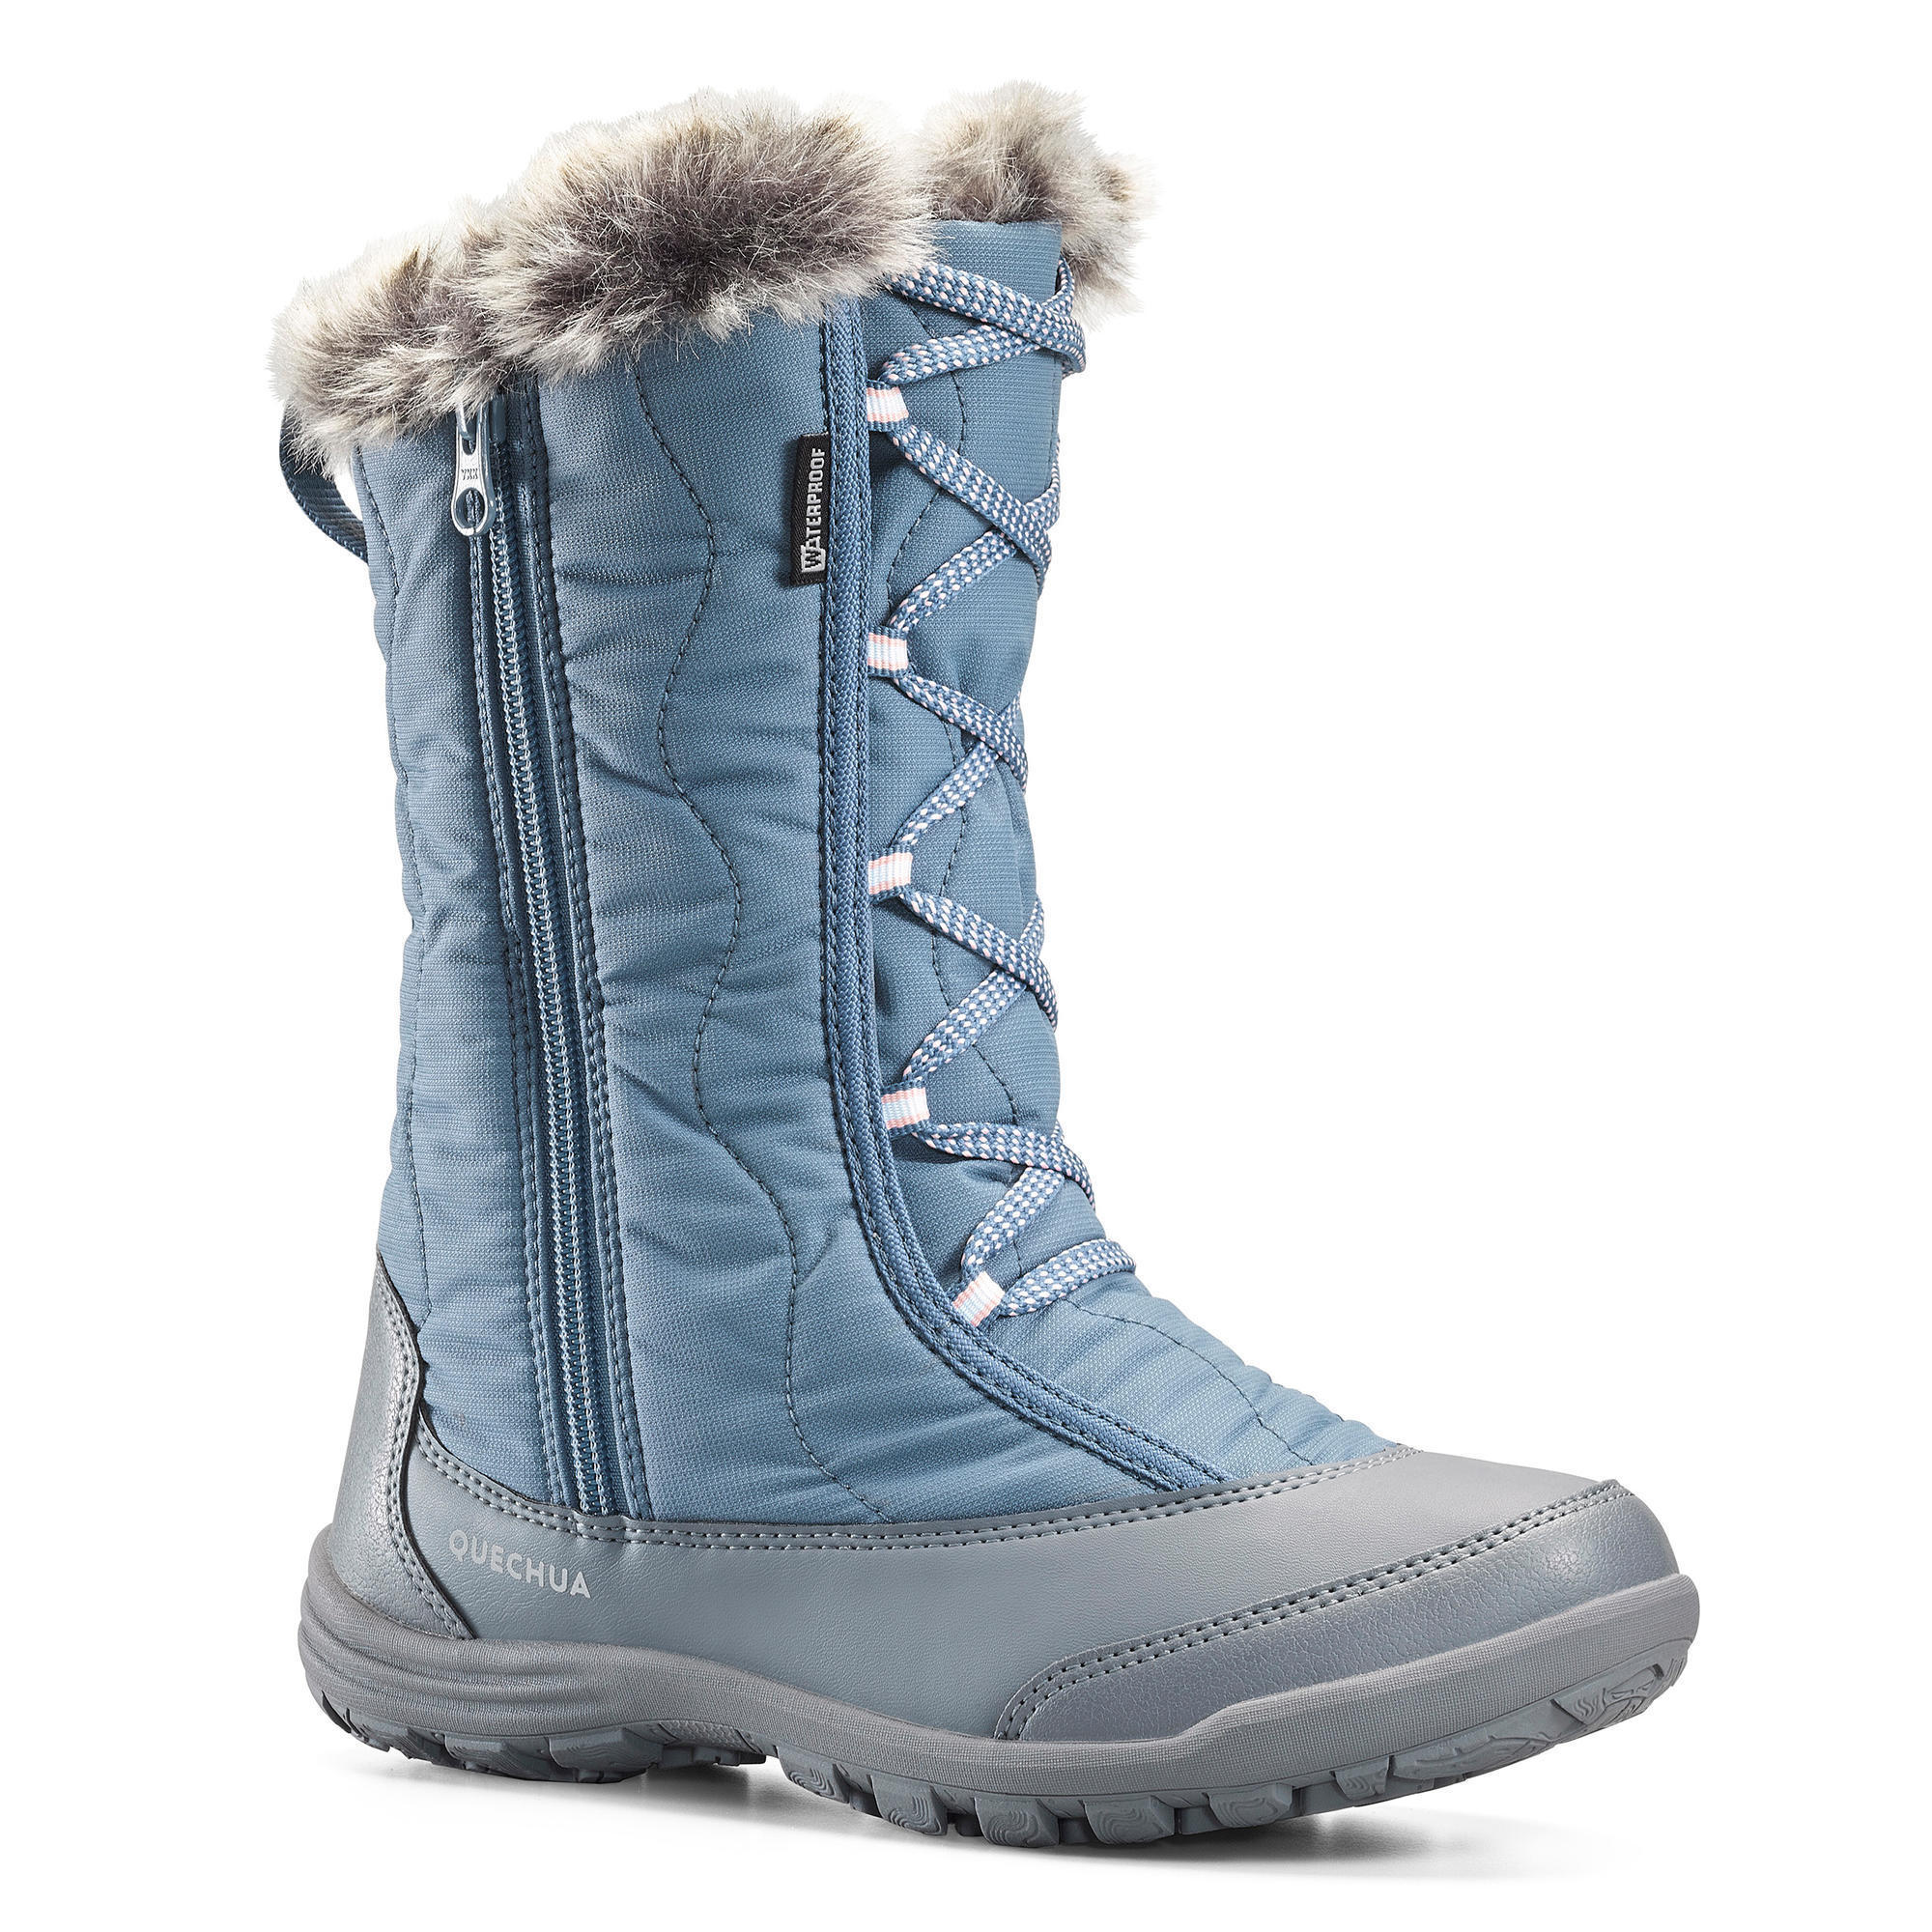 Kids' Snow Boots | Childrens, Girls